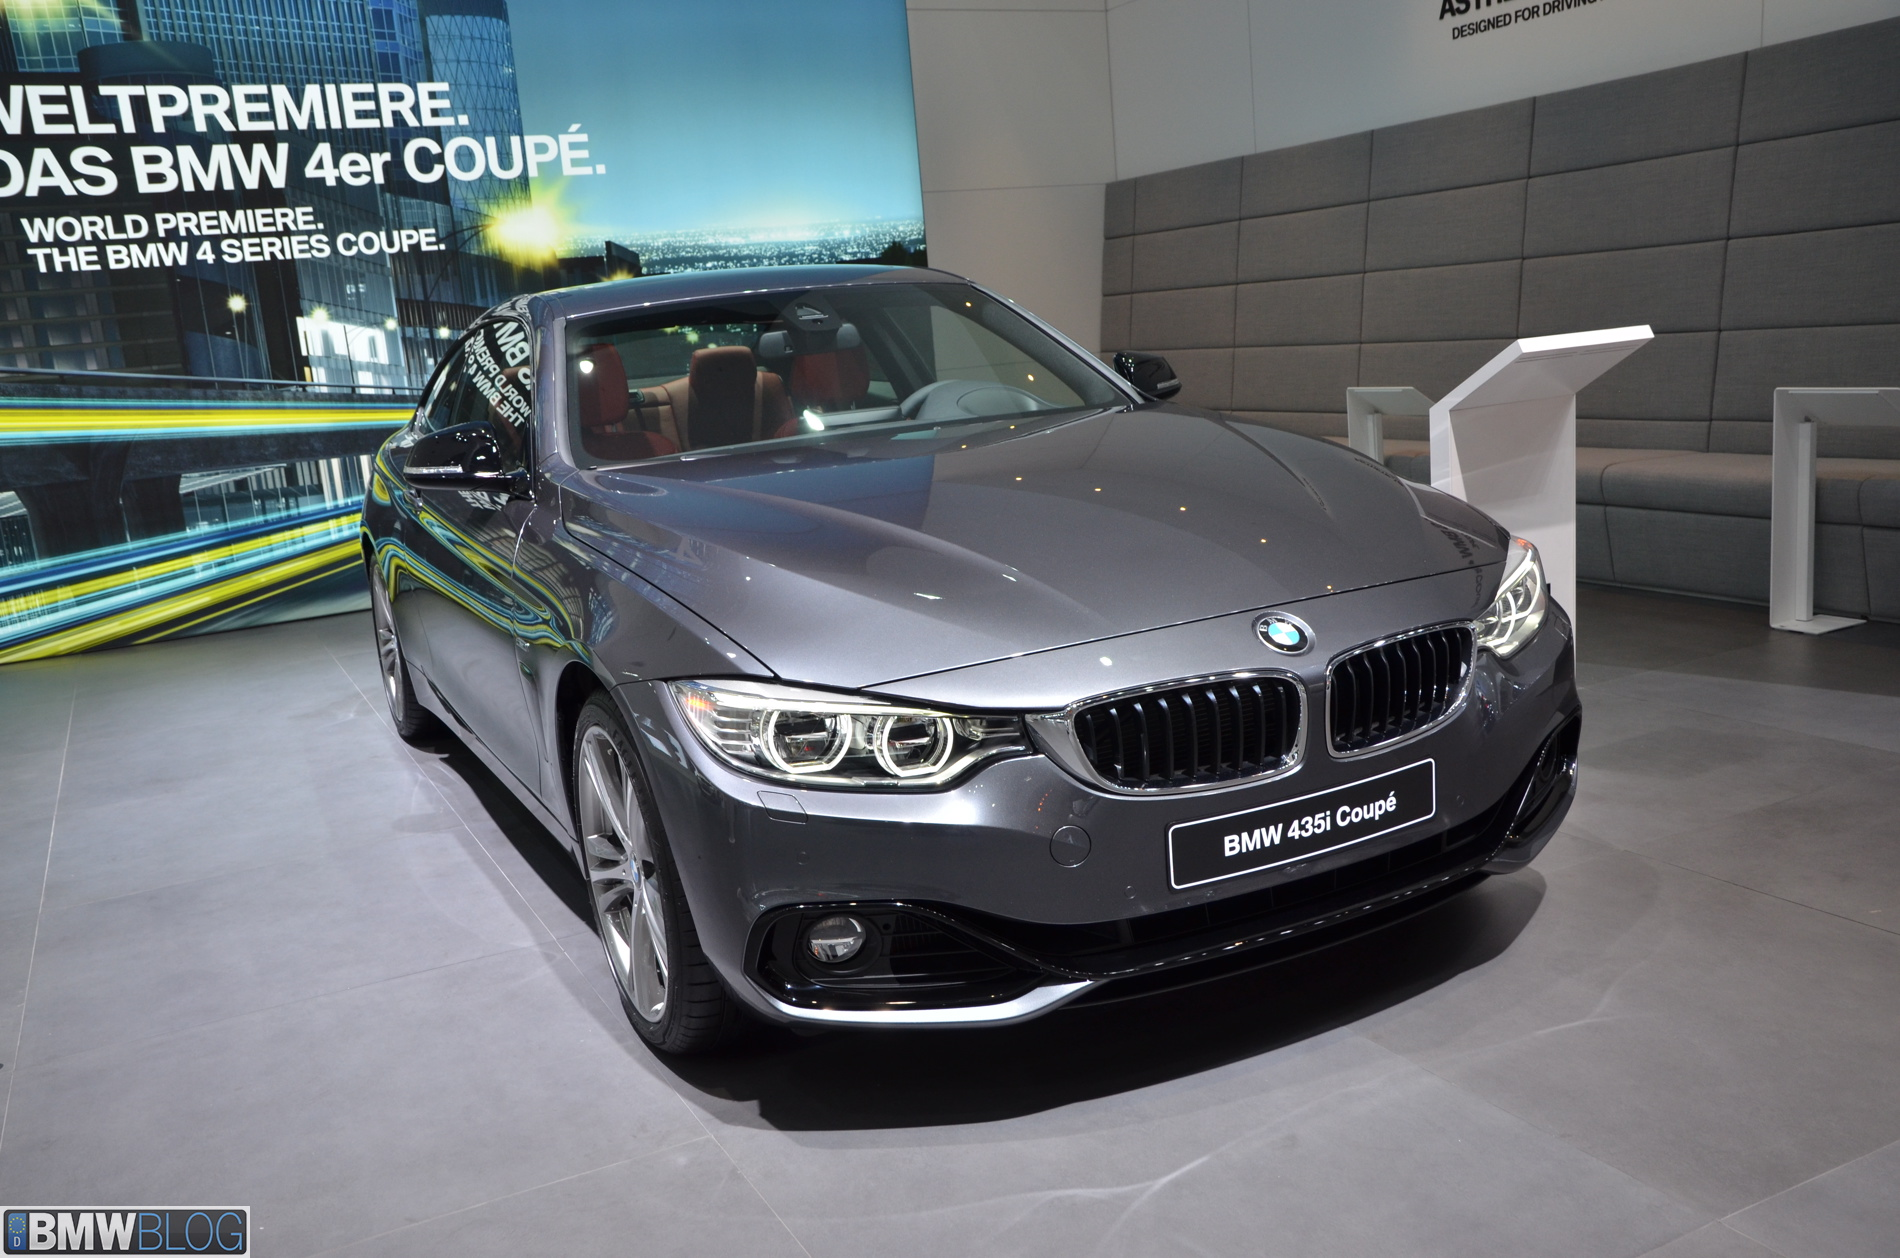 2014 bmw 4 series frankfurt auto show 45